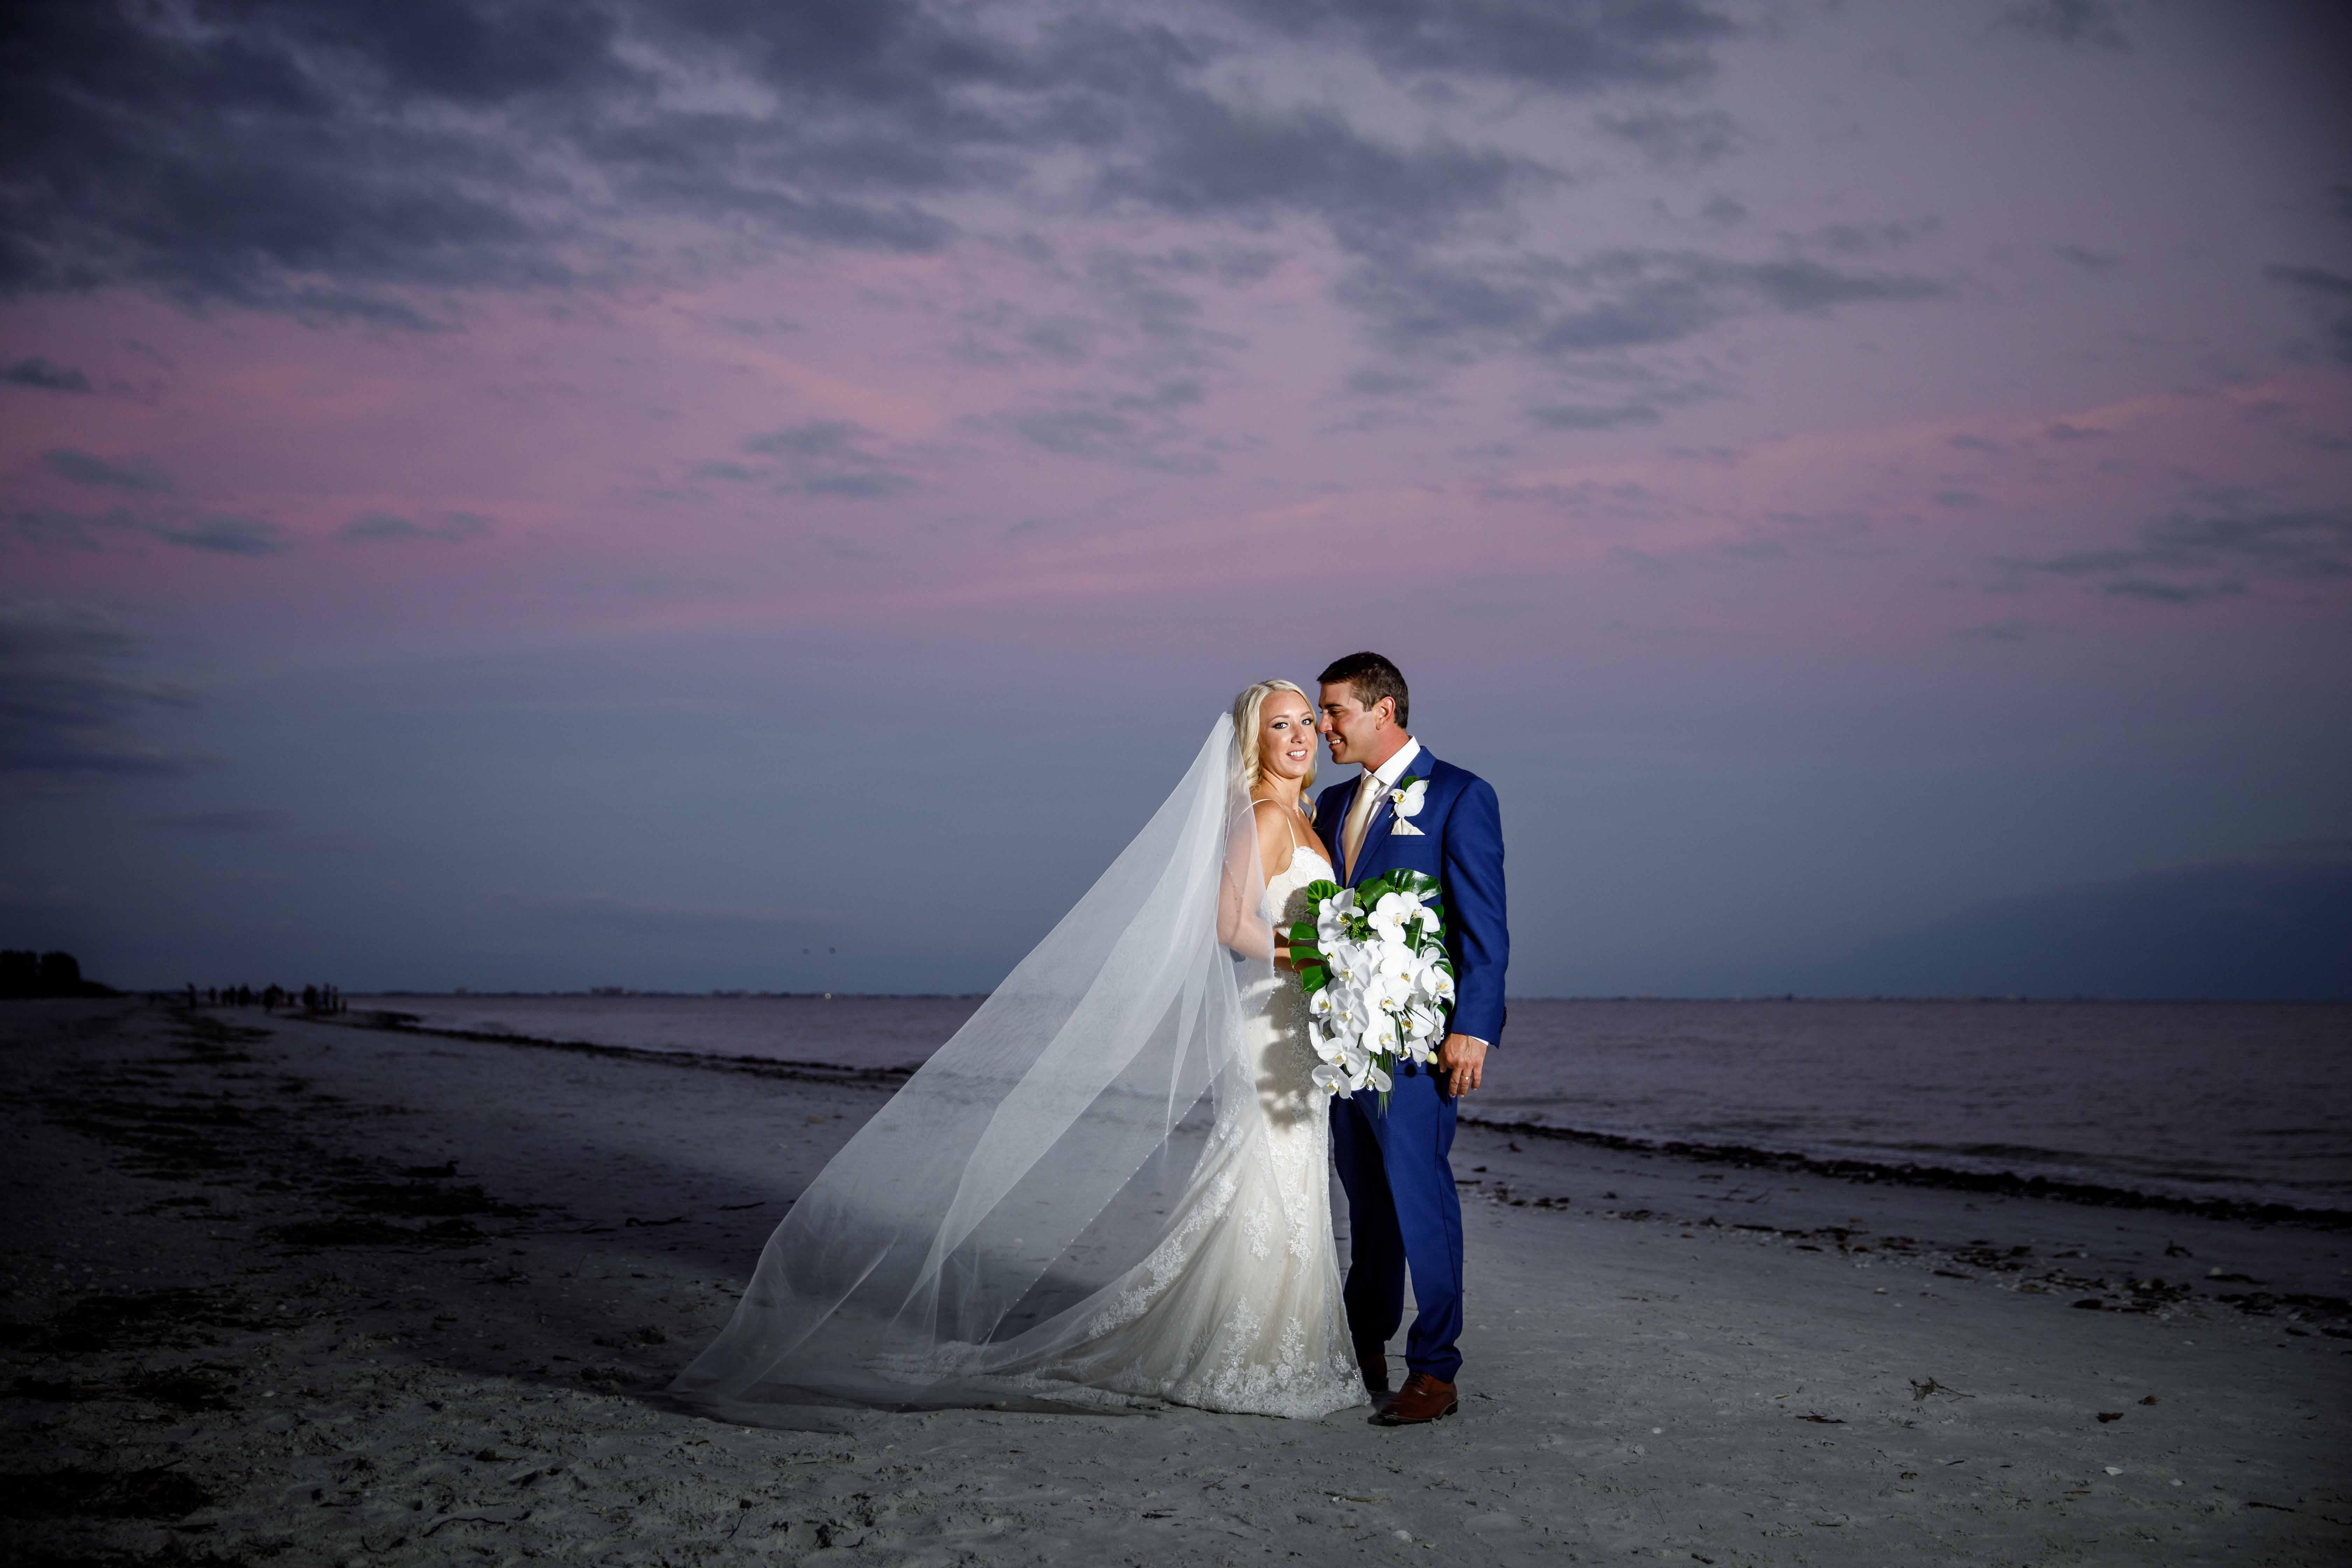 britt and alex wedding nikkimayday photography